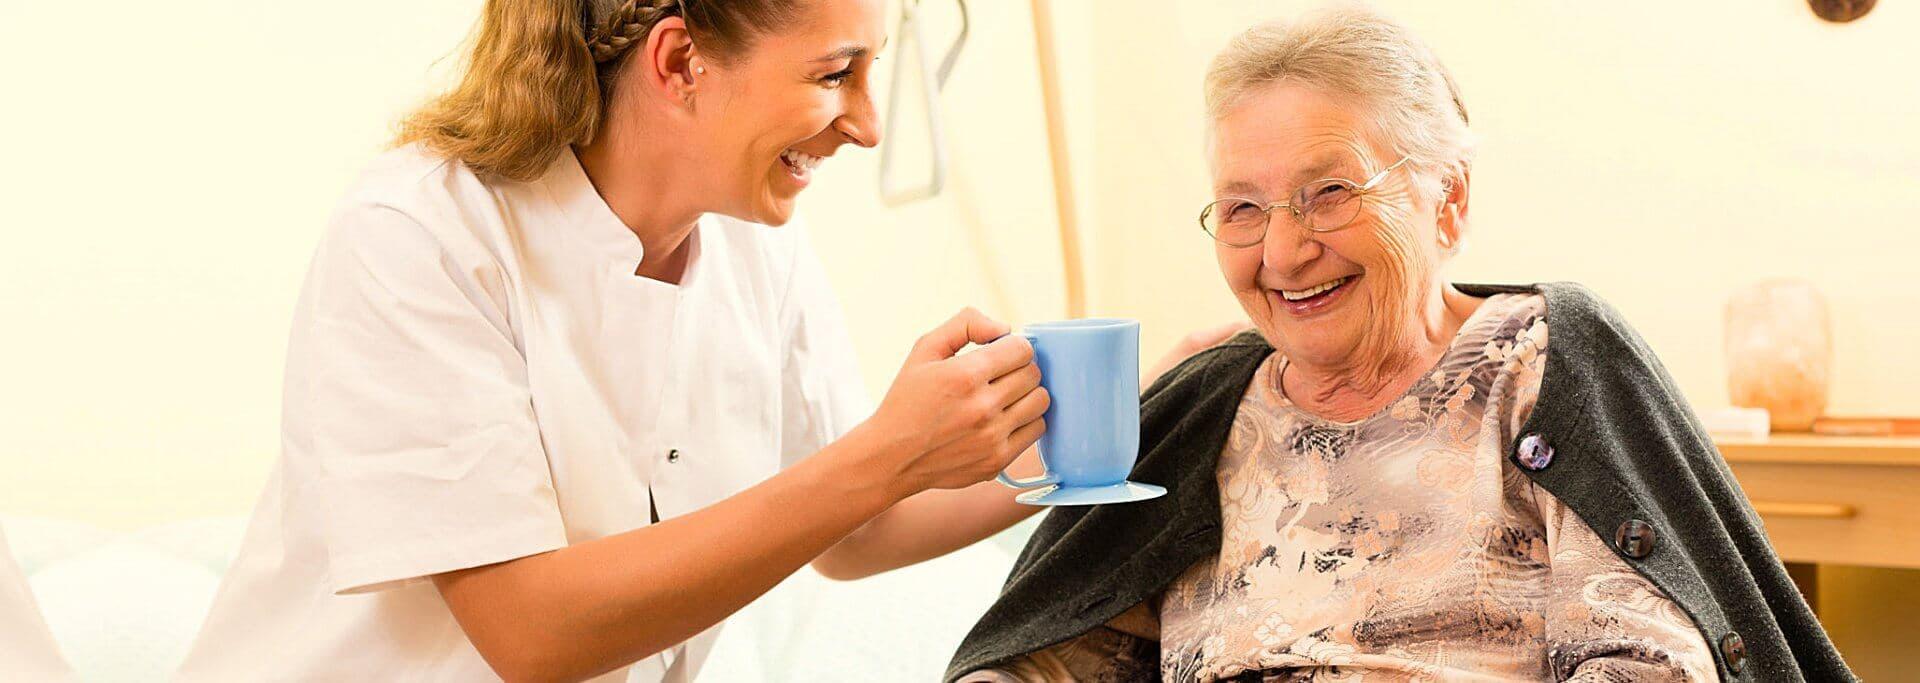 caregiver attending her patient